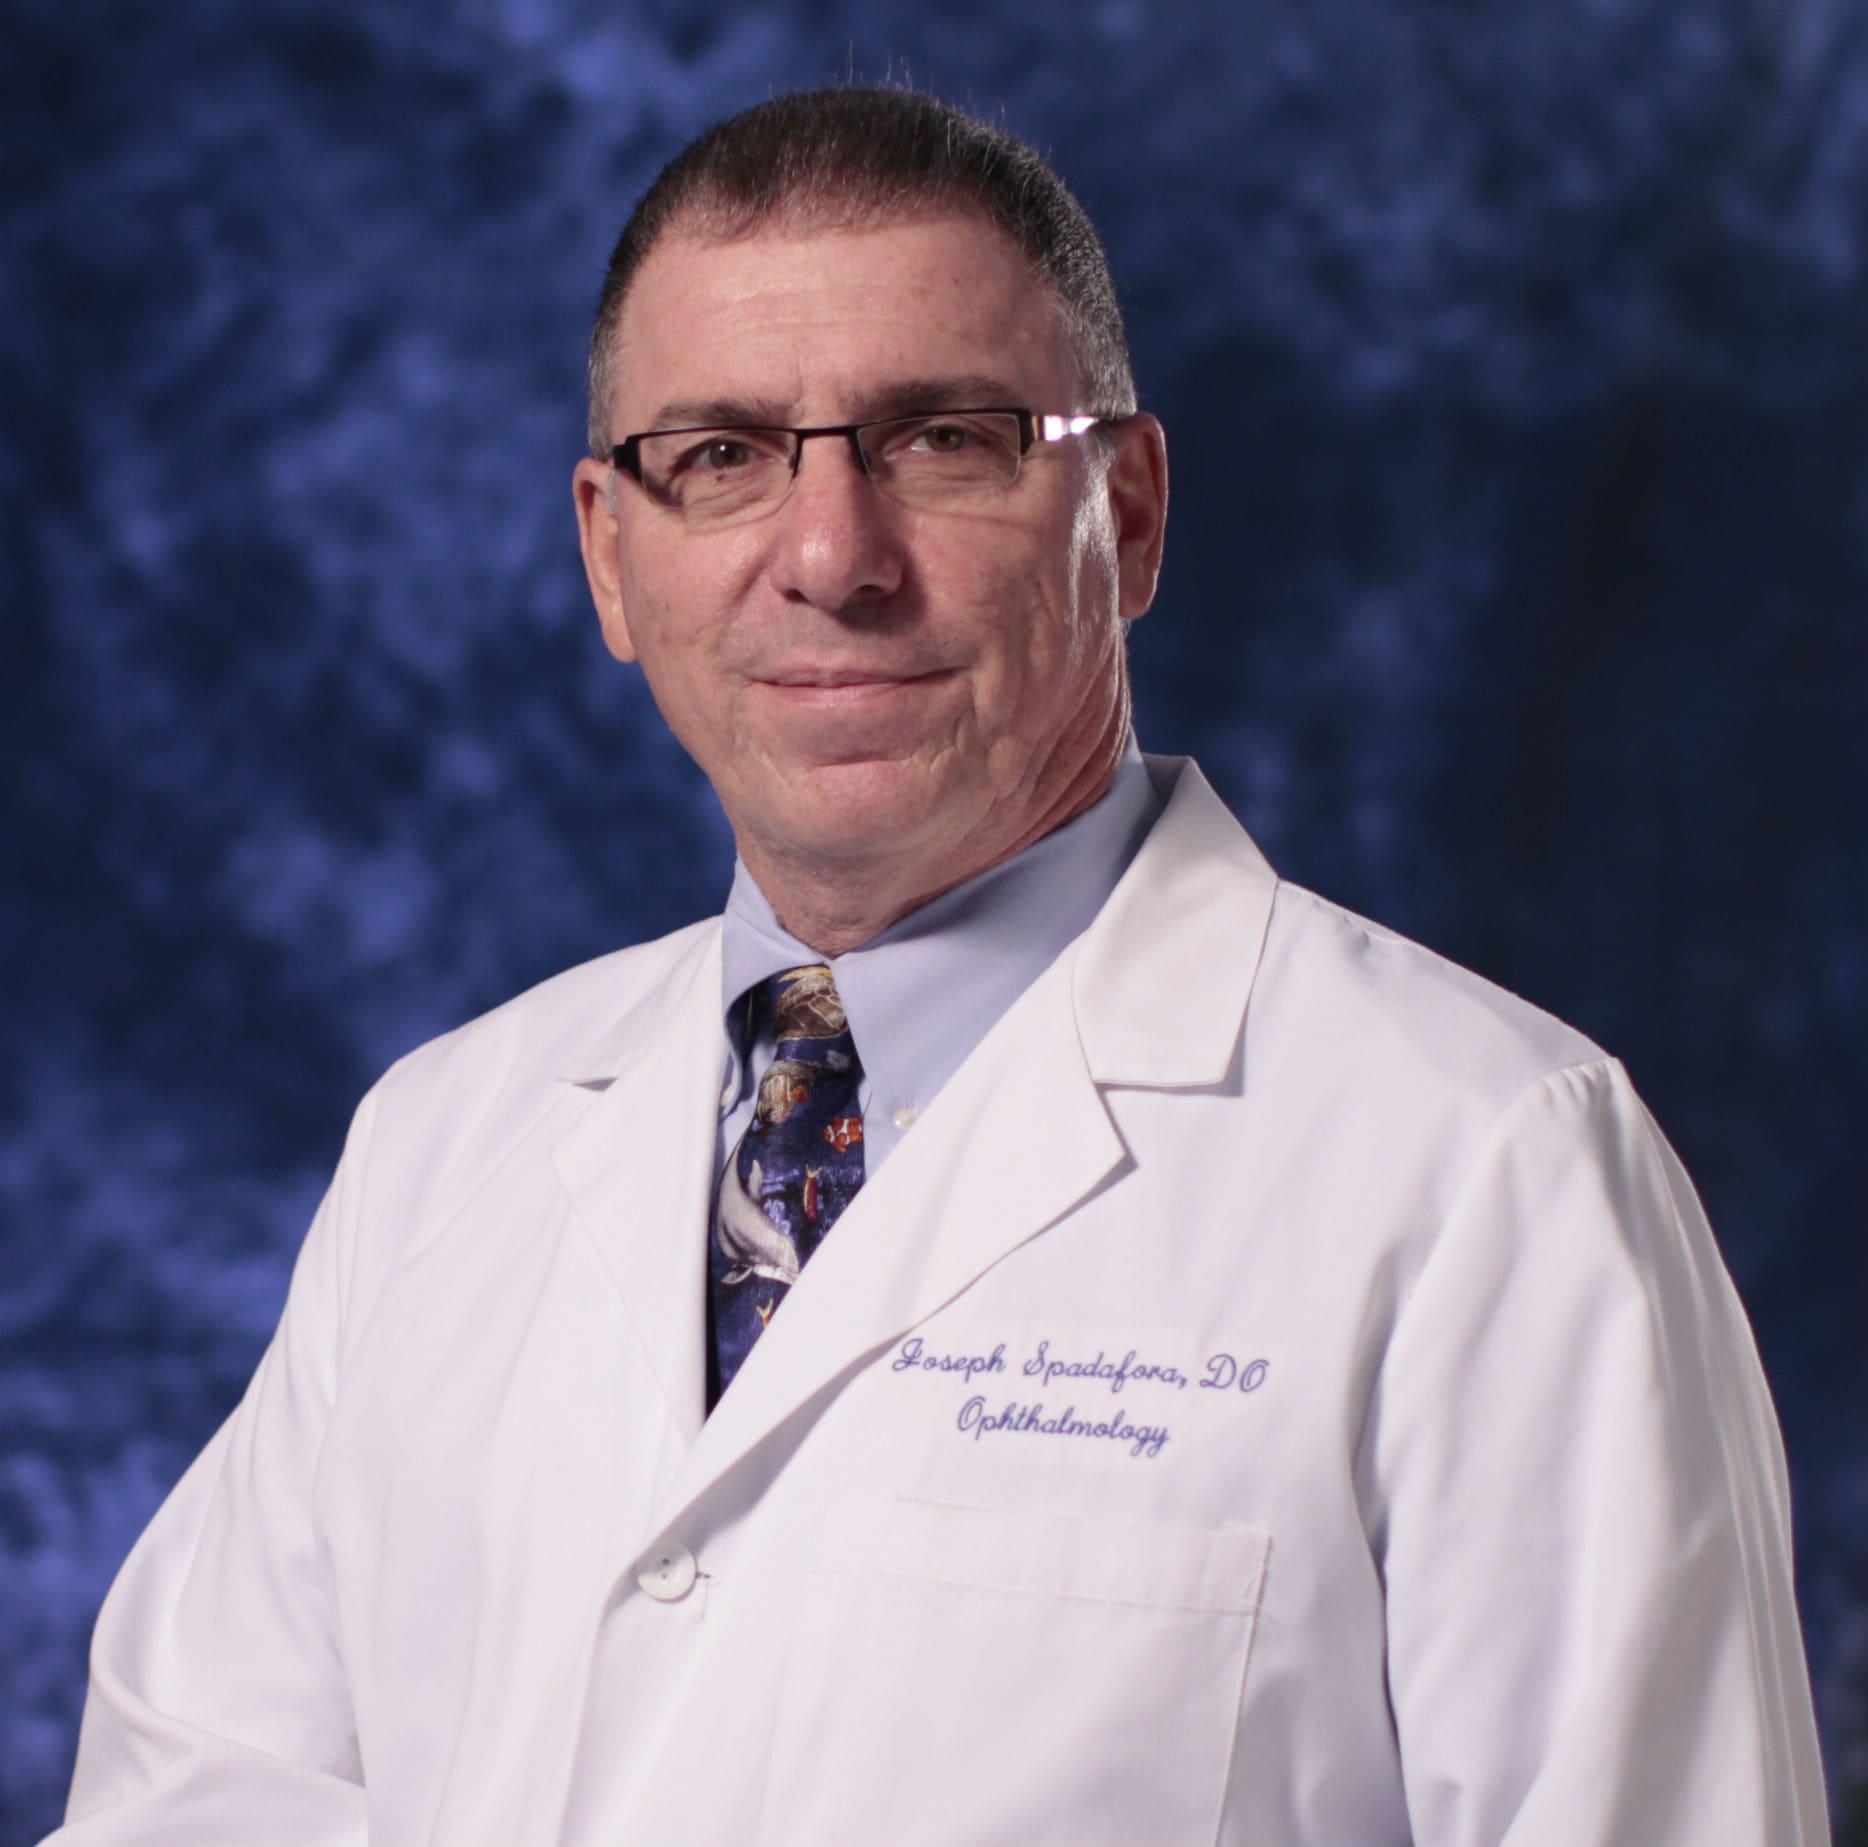 Joseph W Spadafora, DO Ophthalmology